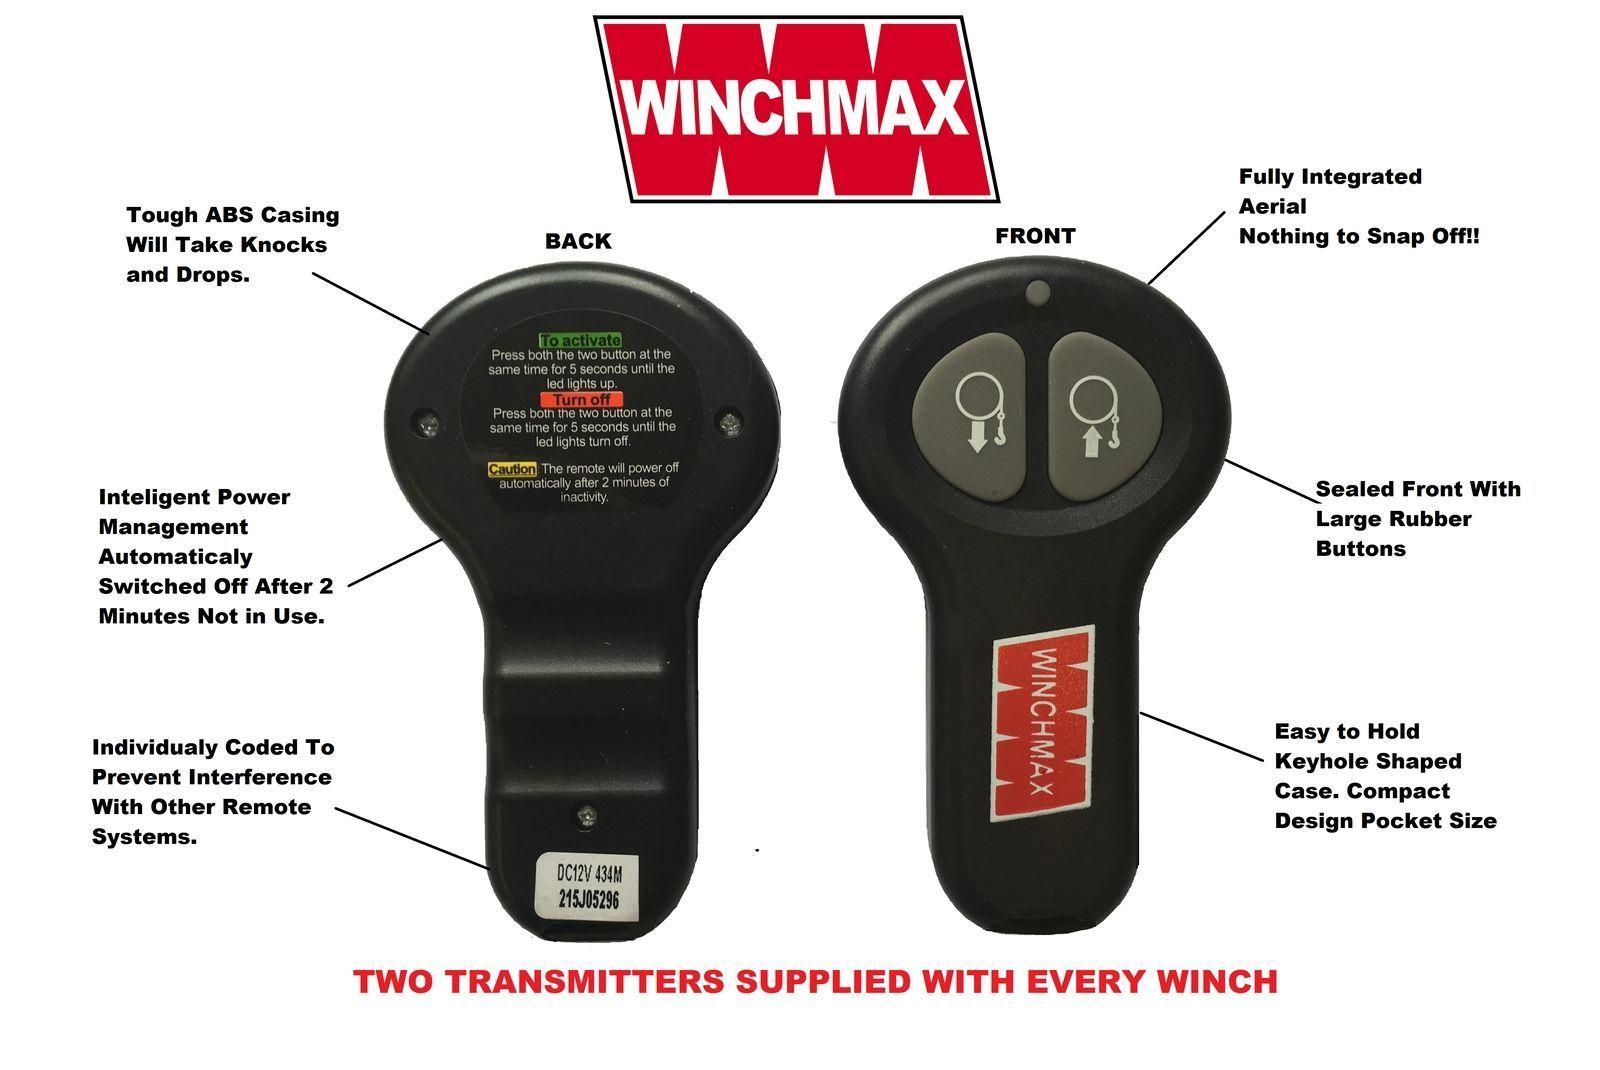 Wireless Winch Remote Control Twin Handset Winchmax Brand Manual Guide